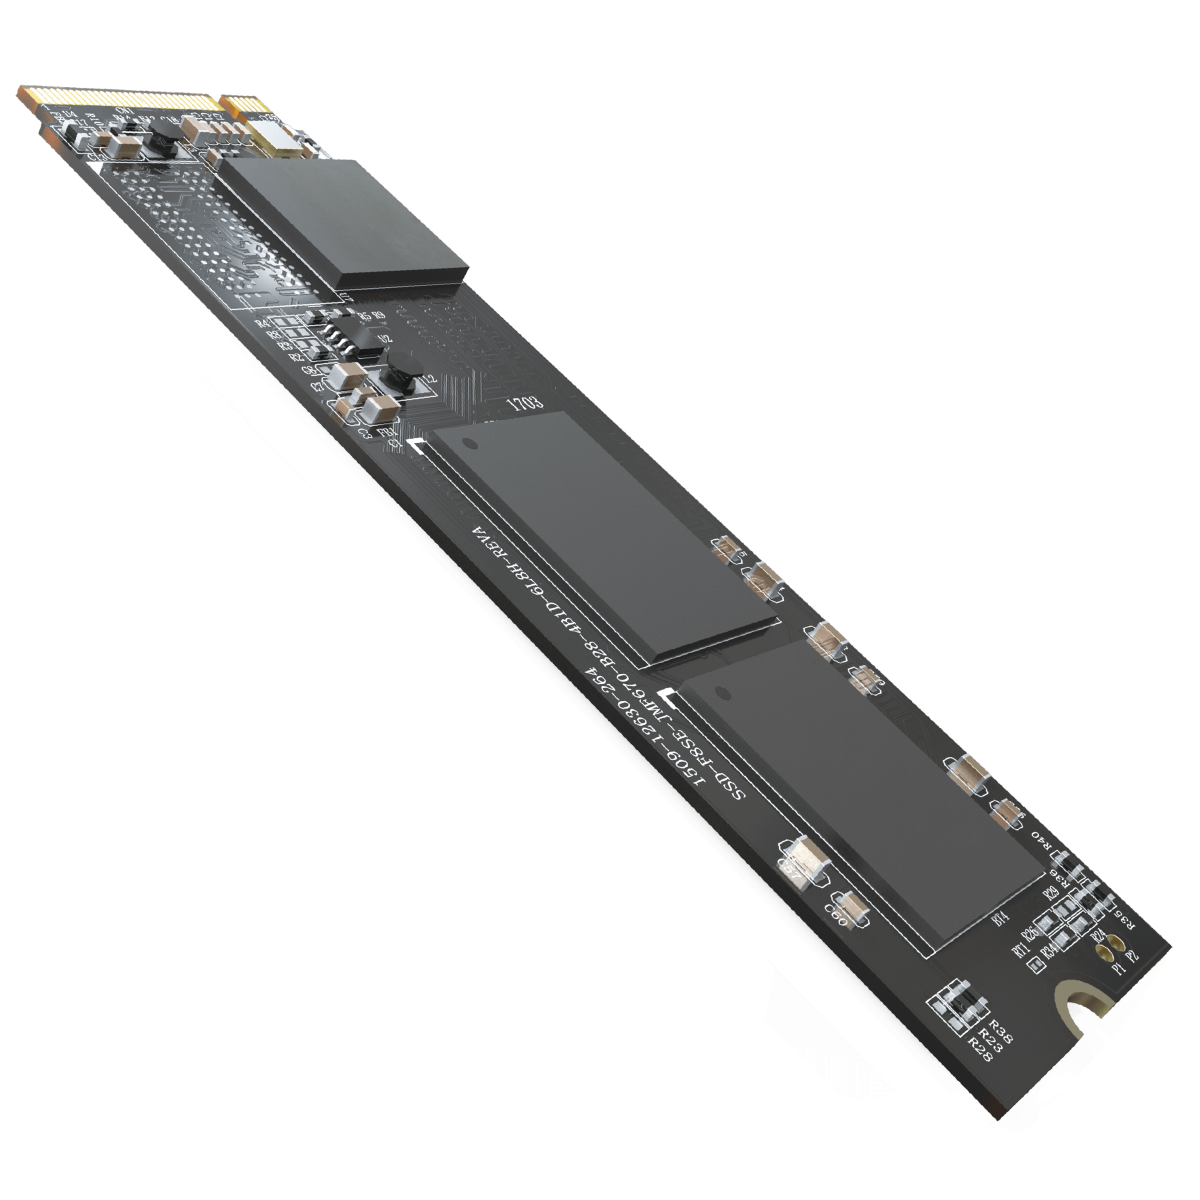 SSD Hikvision Minder, 256GB, M.2 NVMe, Leitura 2300MBs e Gravação 1200MBs, HS-SSD-Minder(P)/256G - IMP